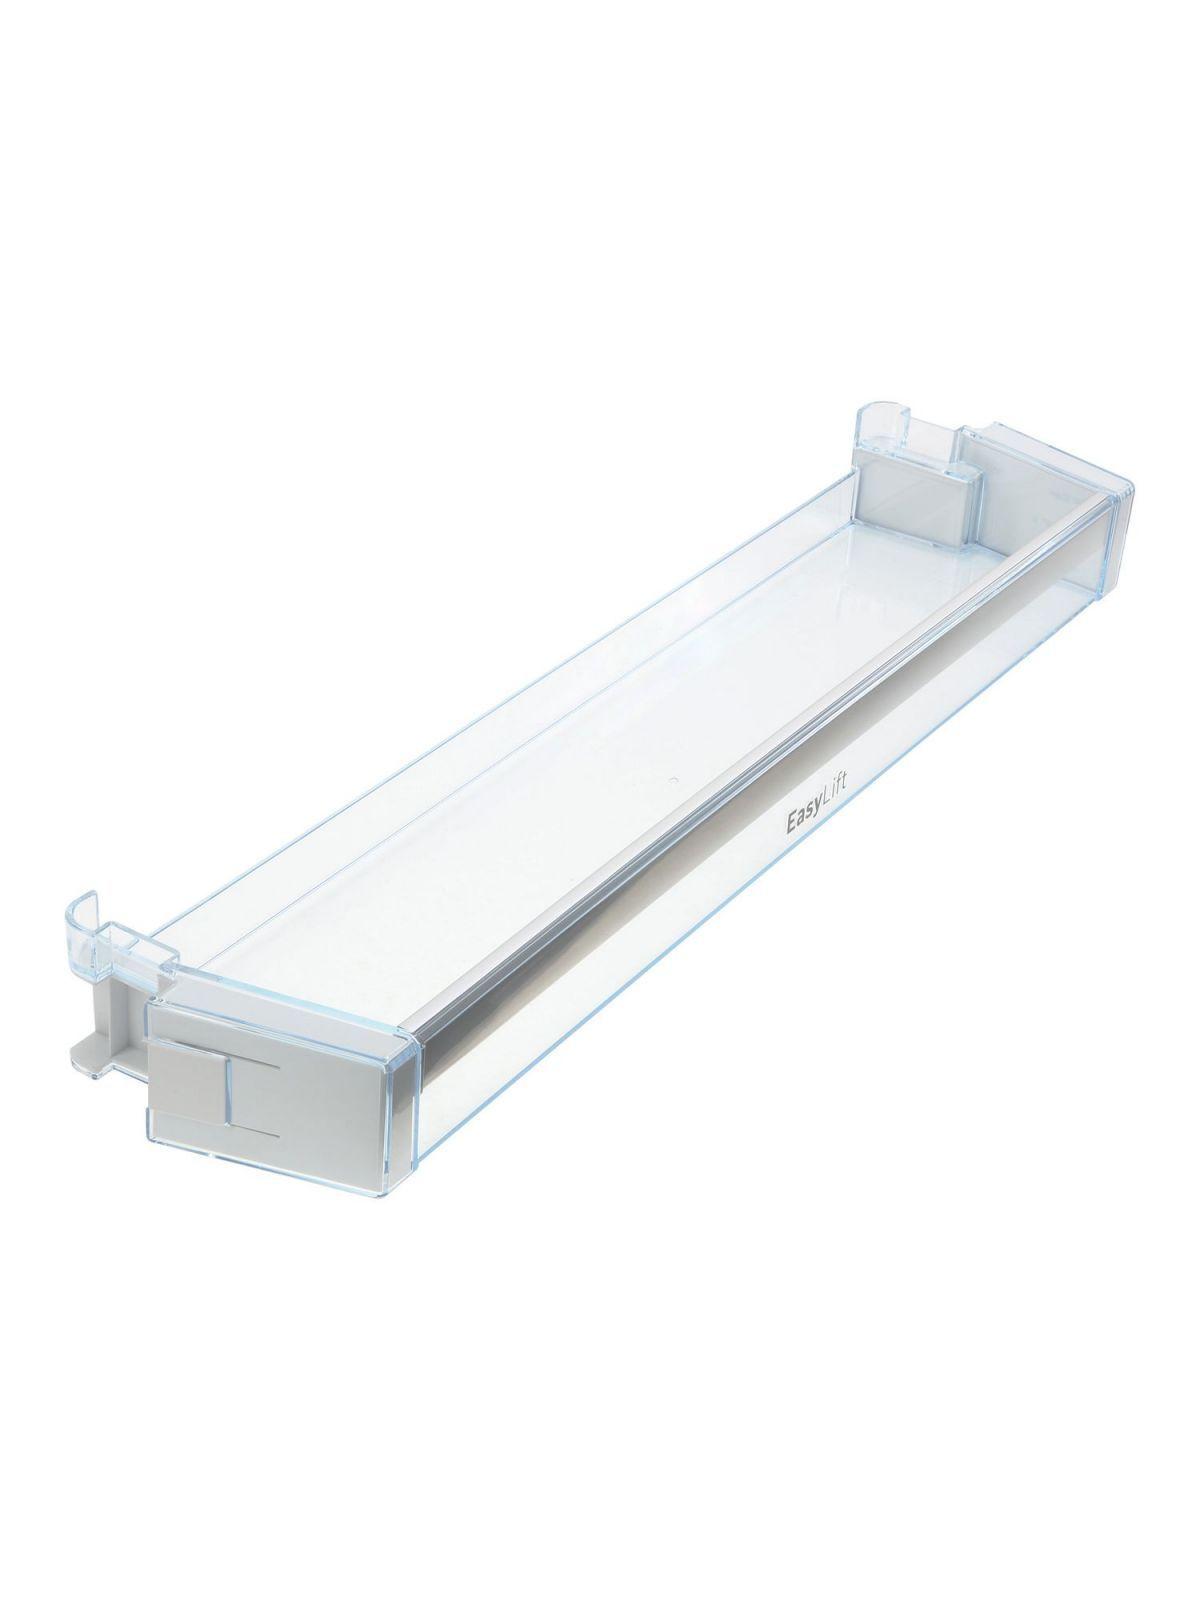 Police chladniček Bosch - 11002517 BSH